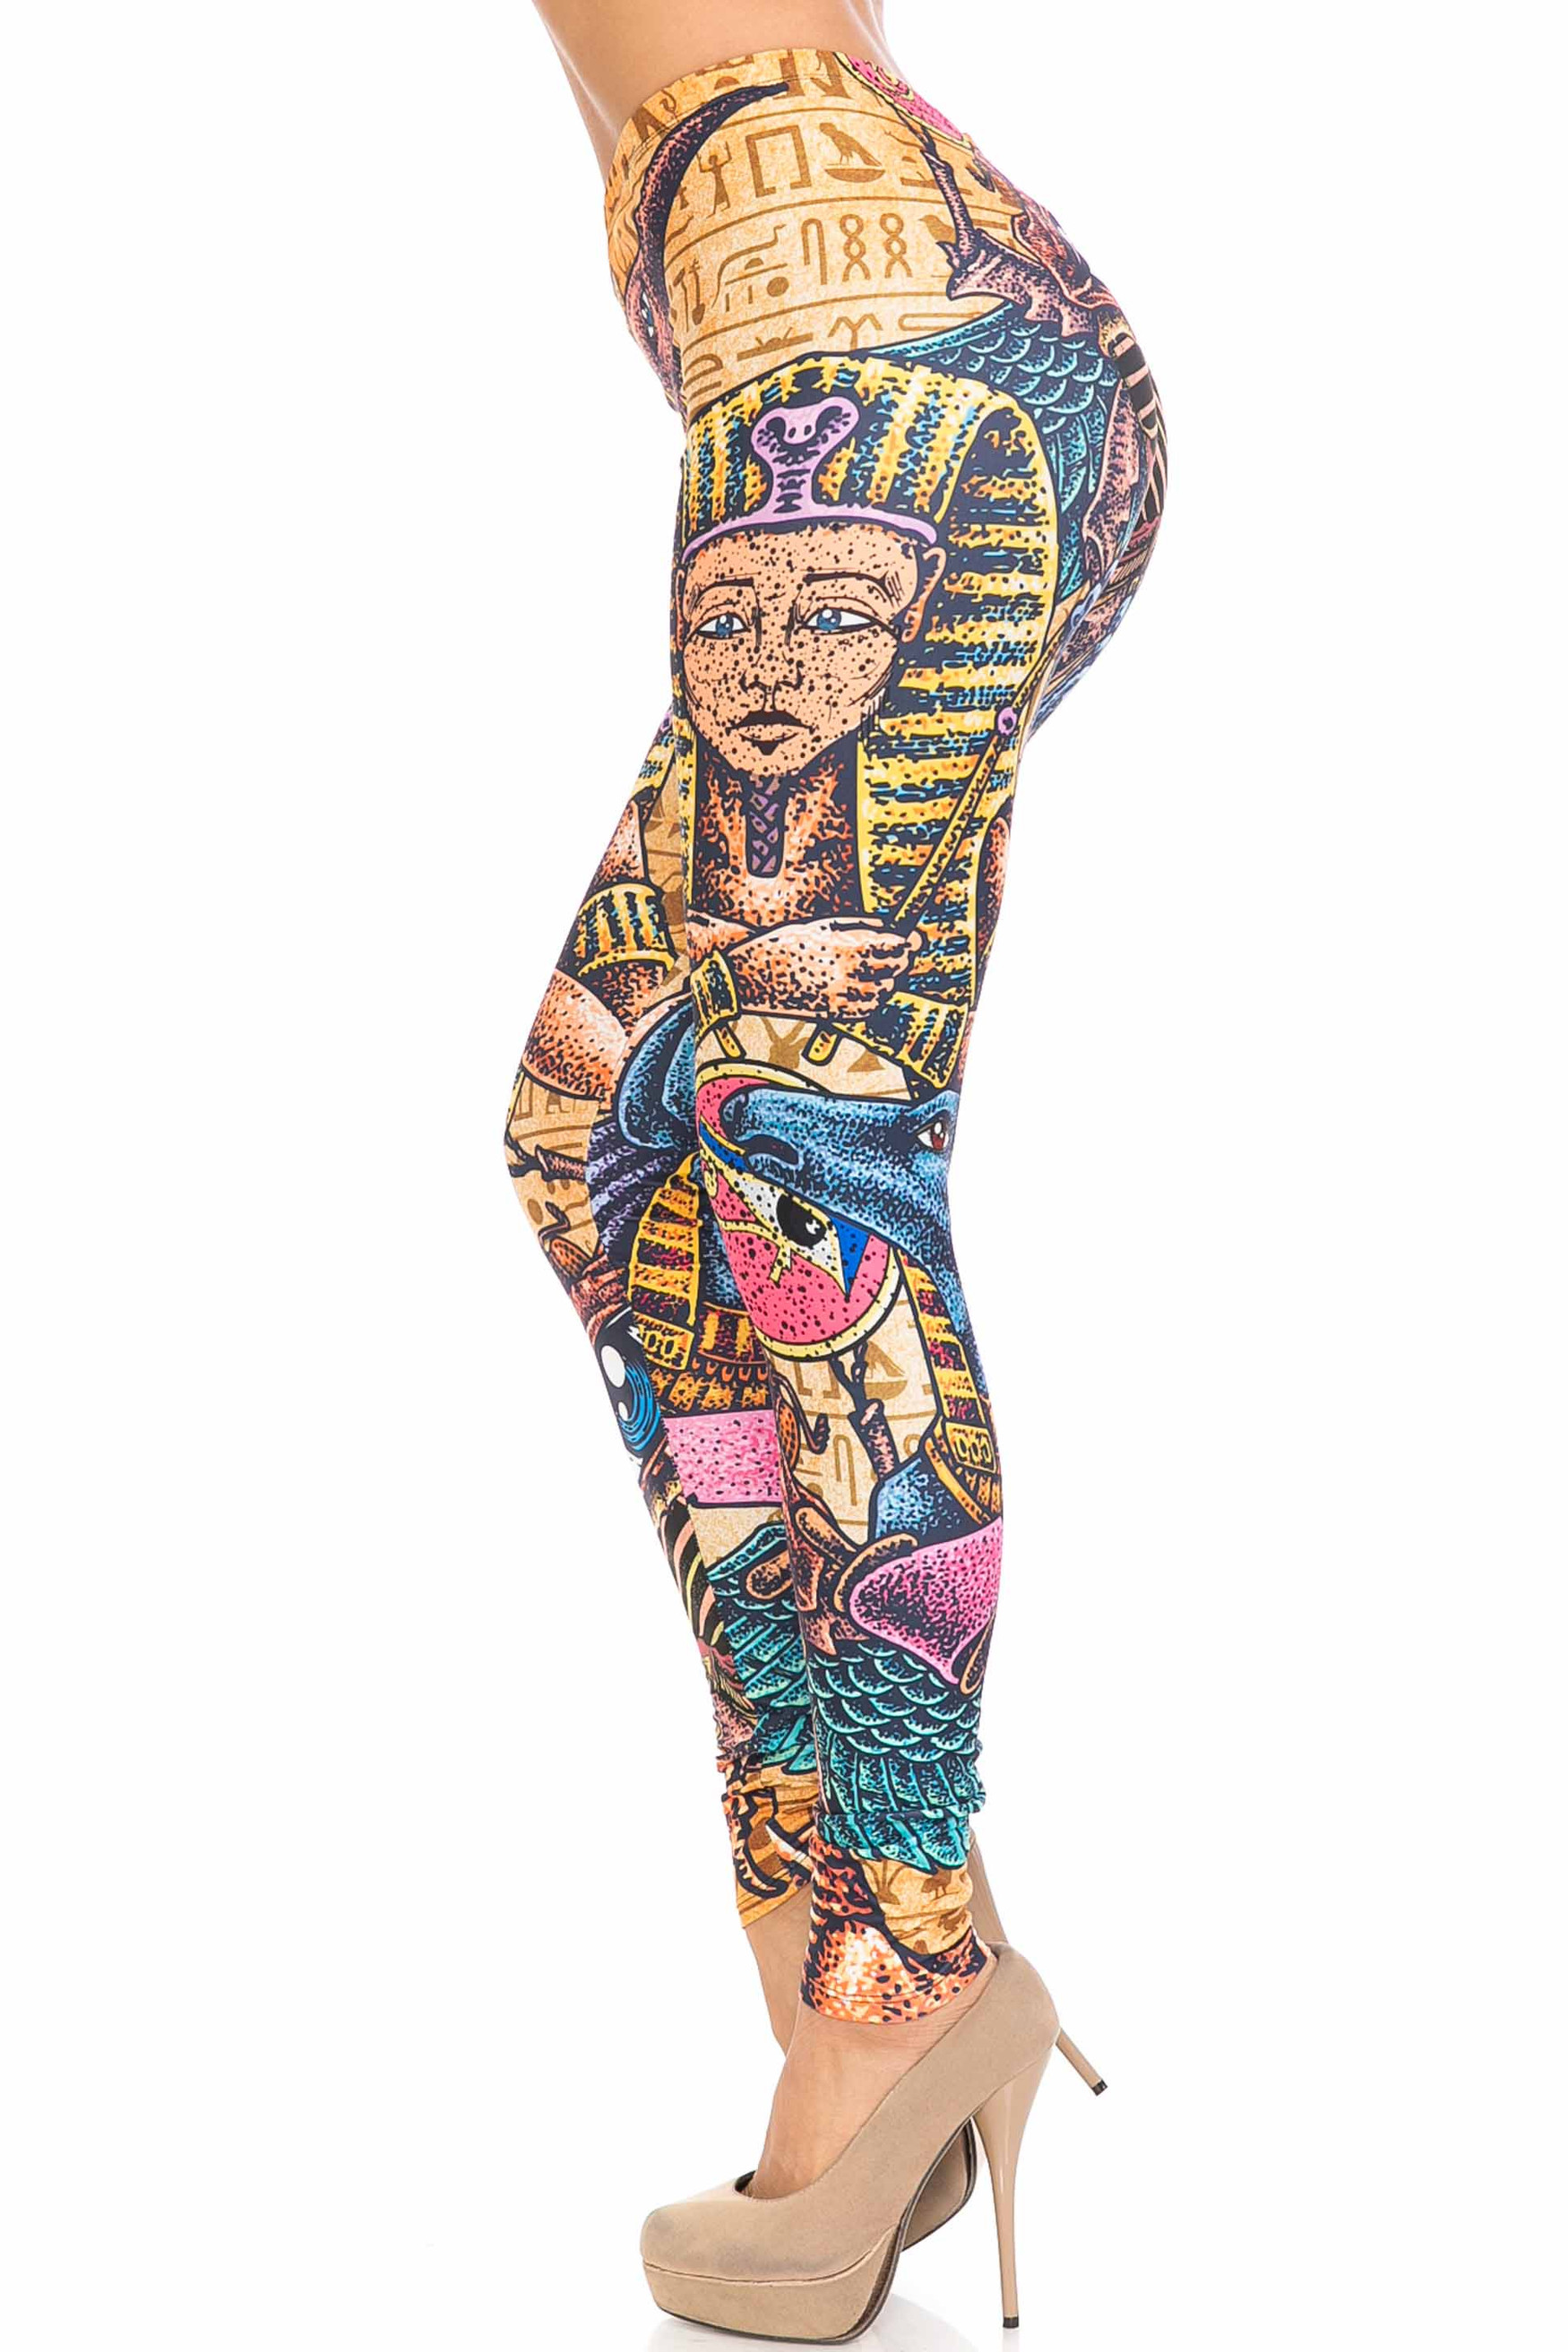 Creamy Soft Gods of Egypt Extra Plus Size Leggings - 3X-5X - USA Fashion™